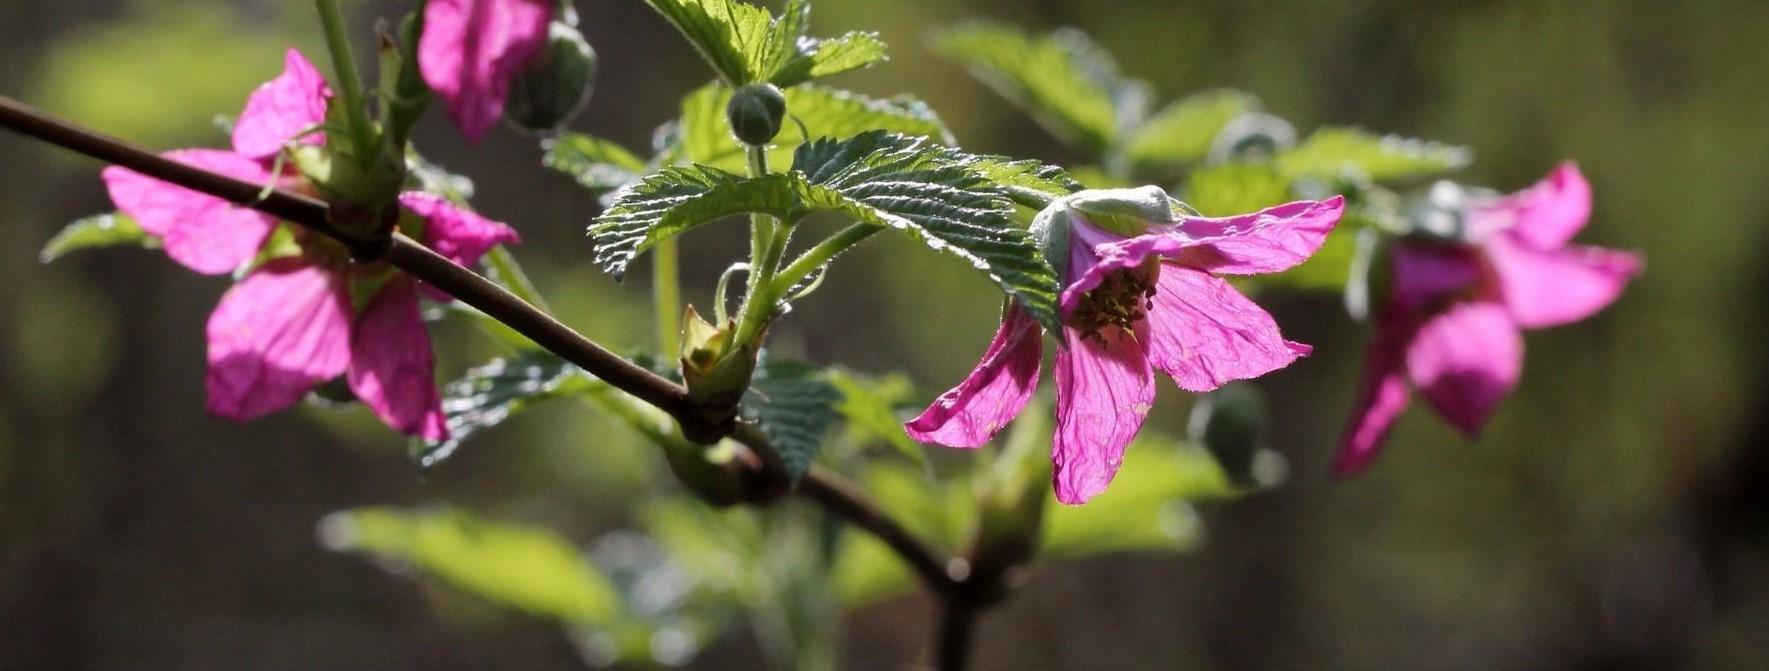 Salmonberry Flowers